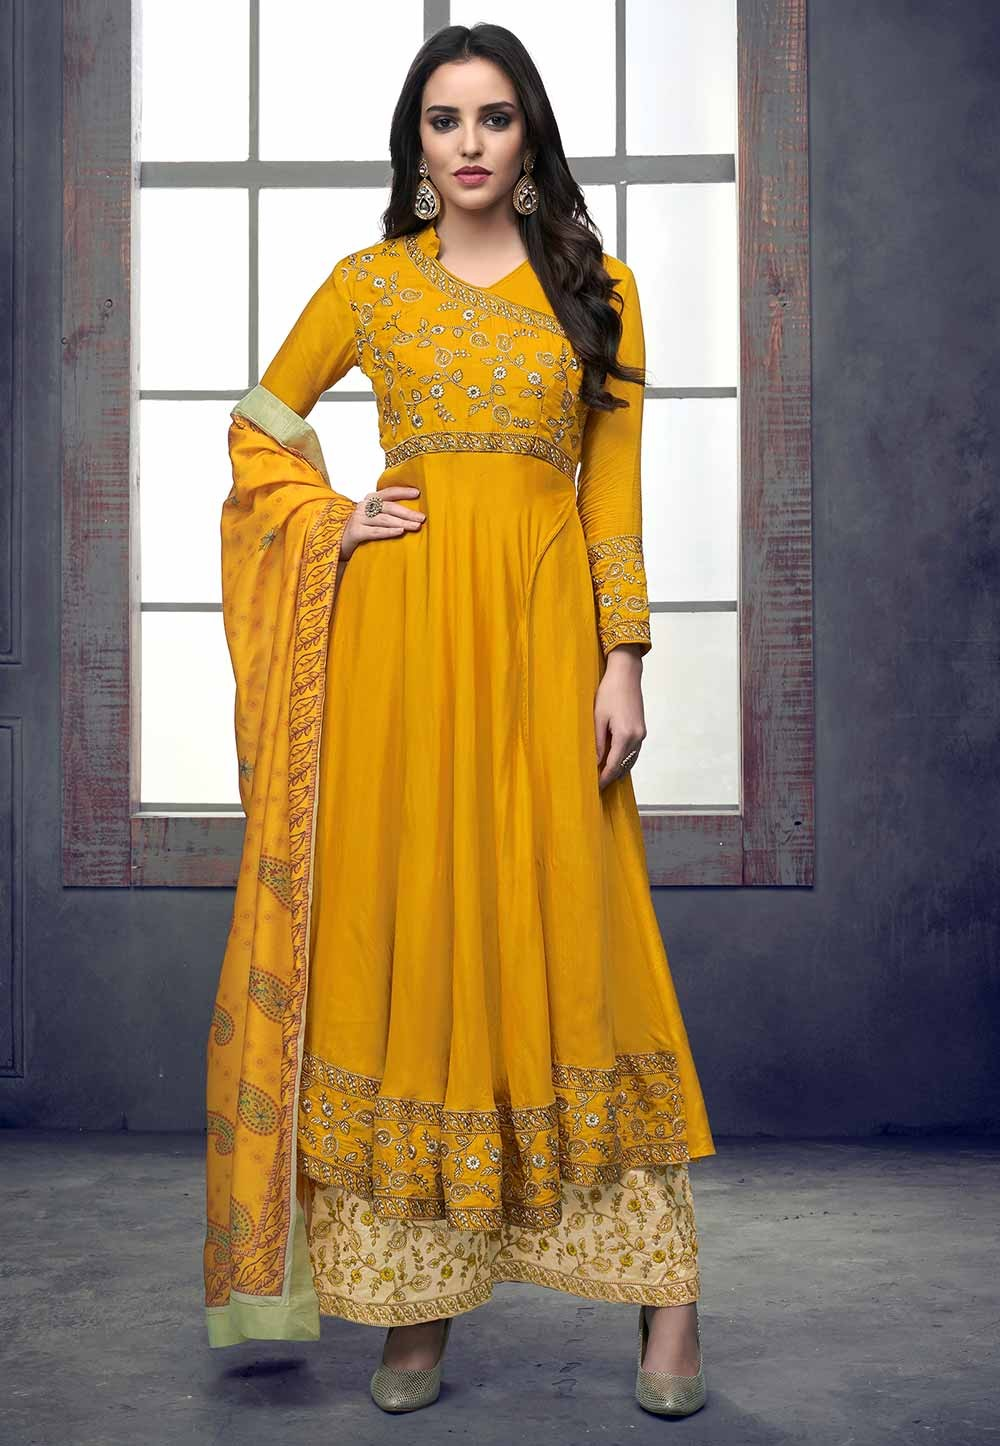 Yellow Colour Party Wear Salwar Kameez